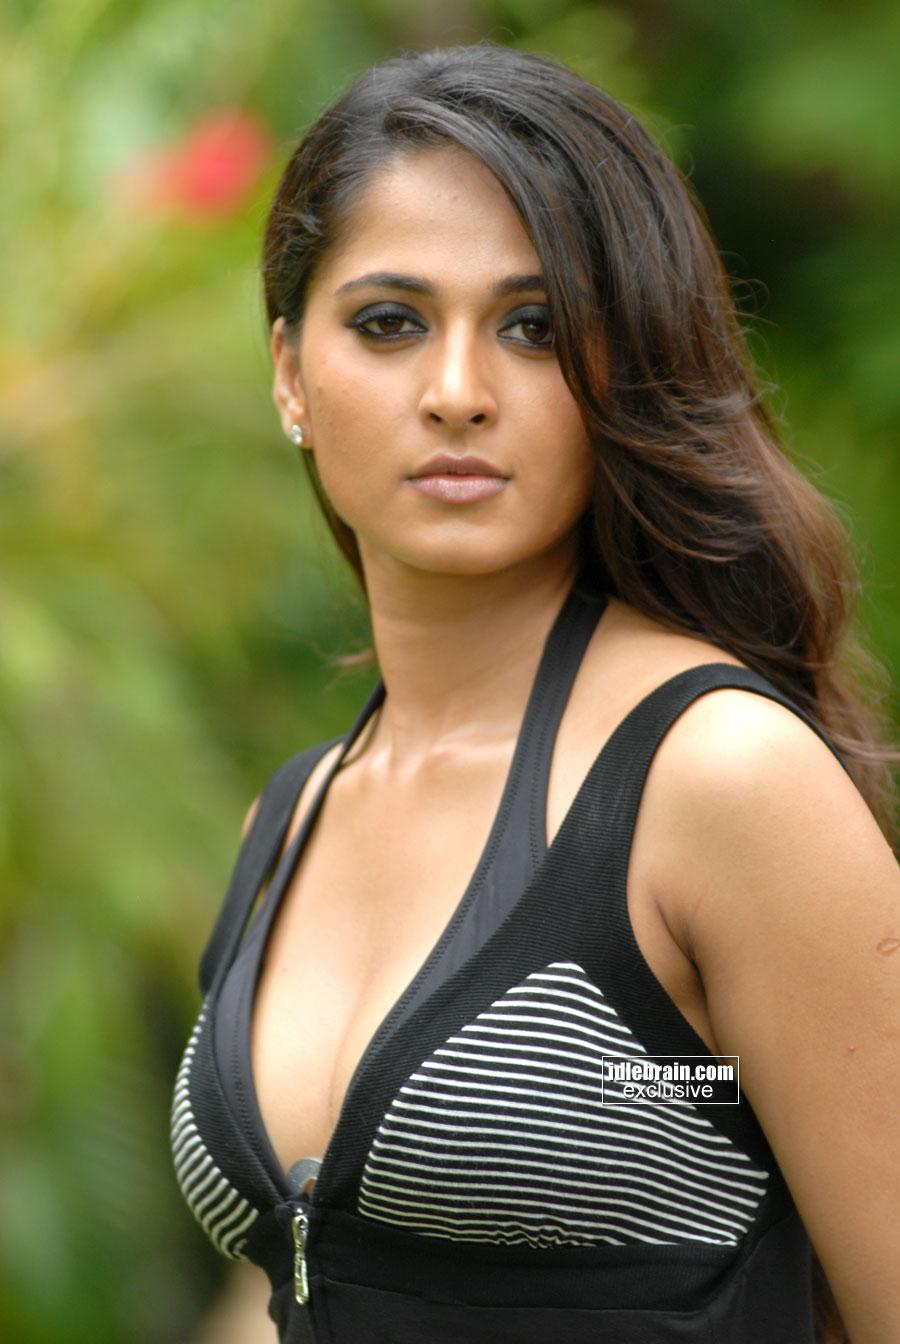 HOT INDIAN ACTRESS BLOG: HOT ANUSHKA SHETTY Pics Cute and